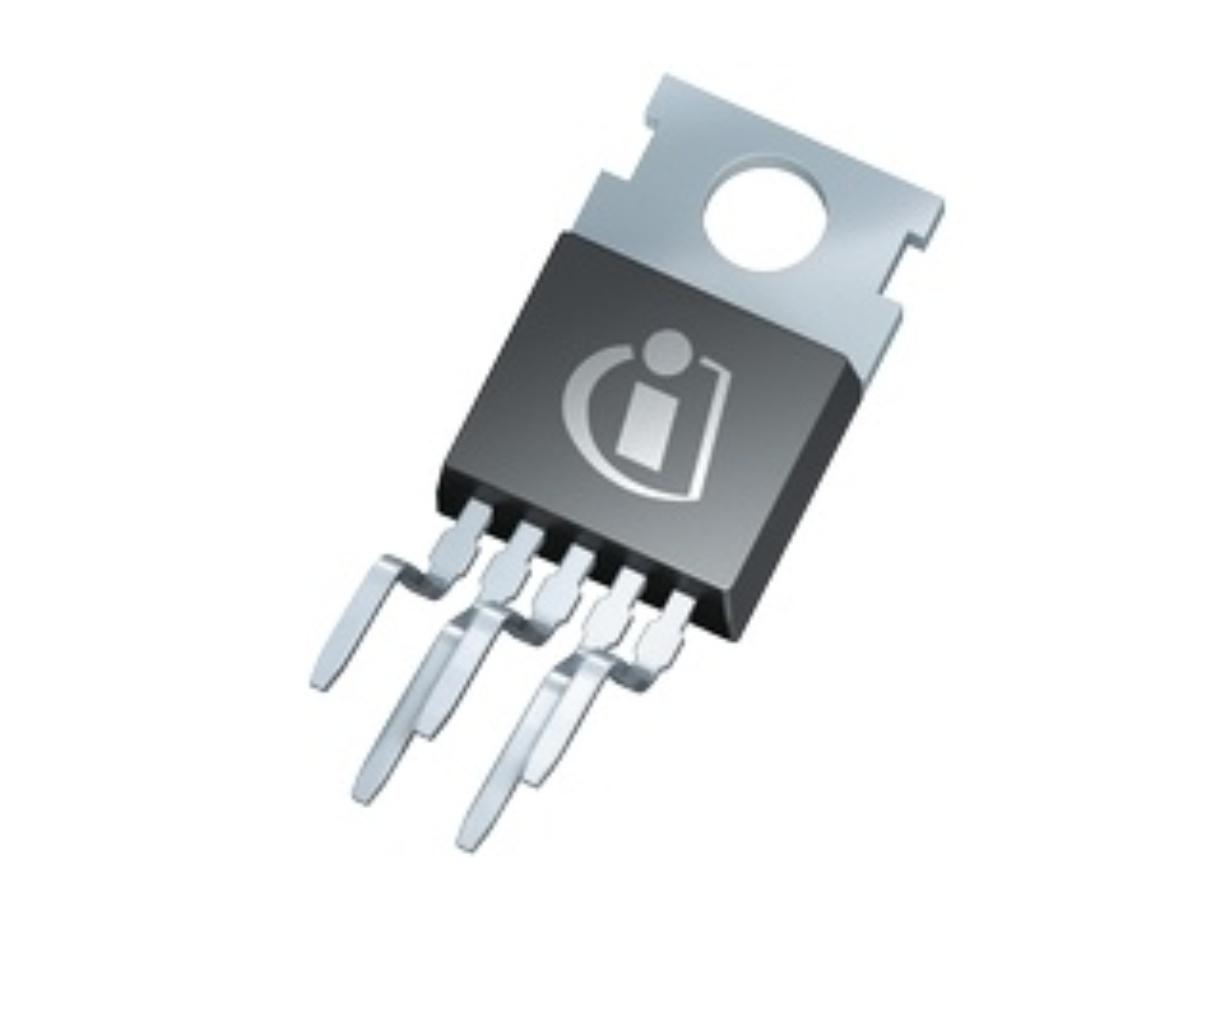 Bts432e2 Infineon Technologies Ac Motor Control Circuits Electric Worksheets 01 2010 02 Pdf 215 Kb